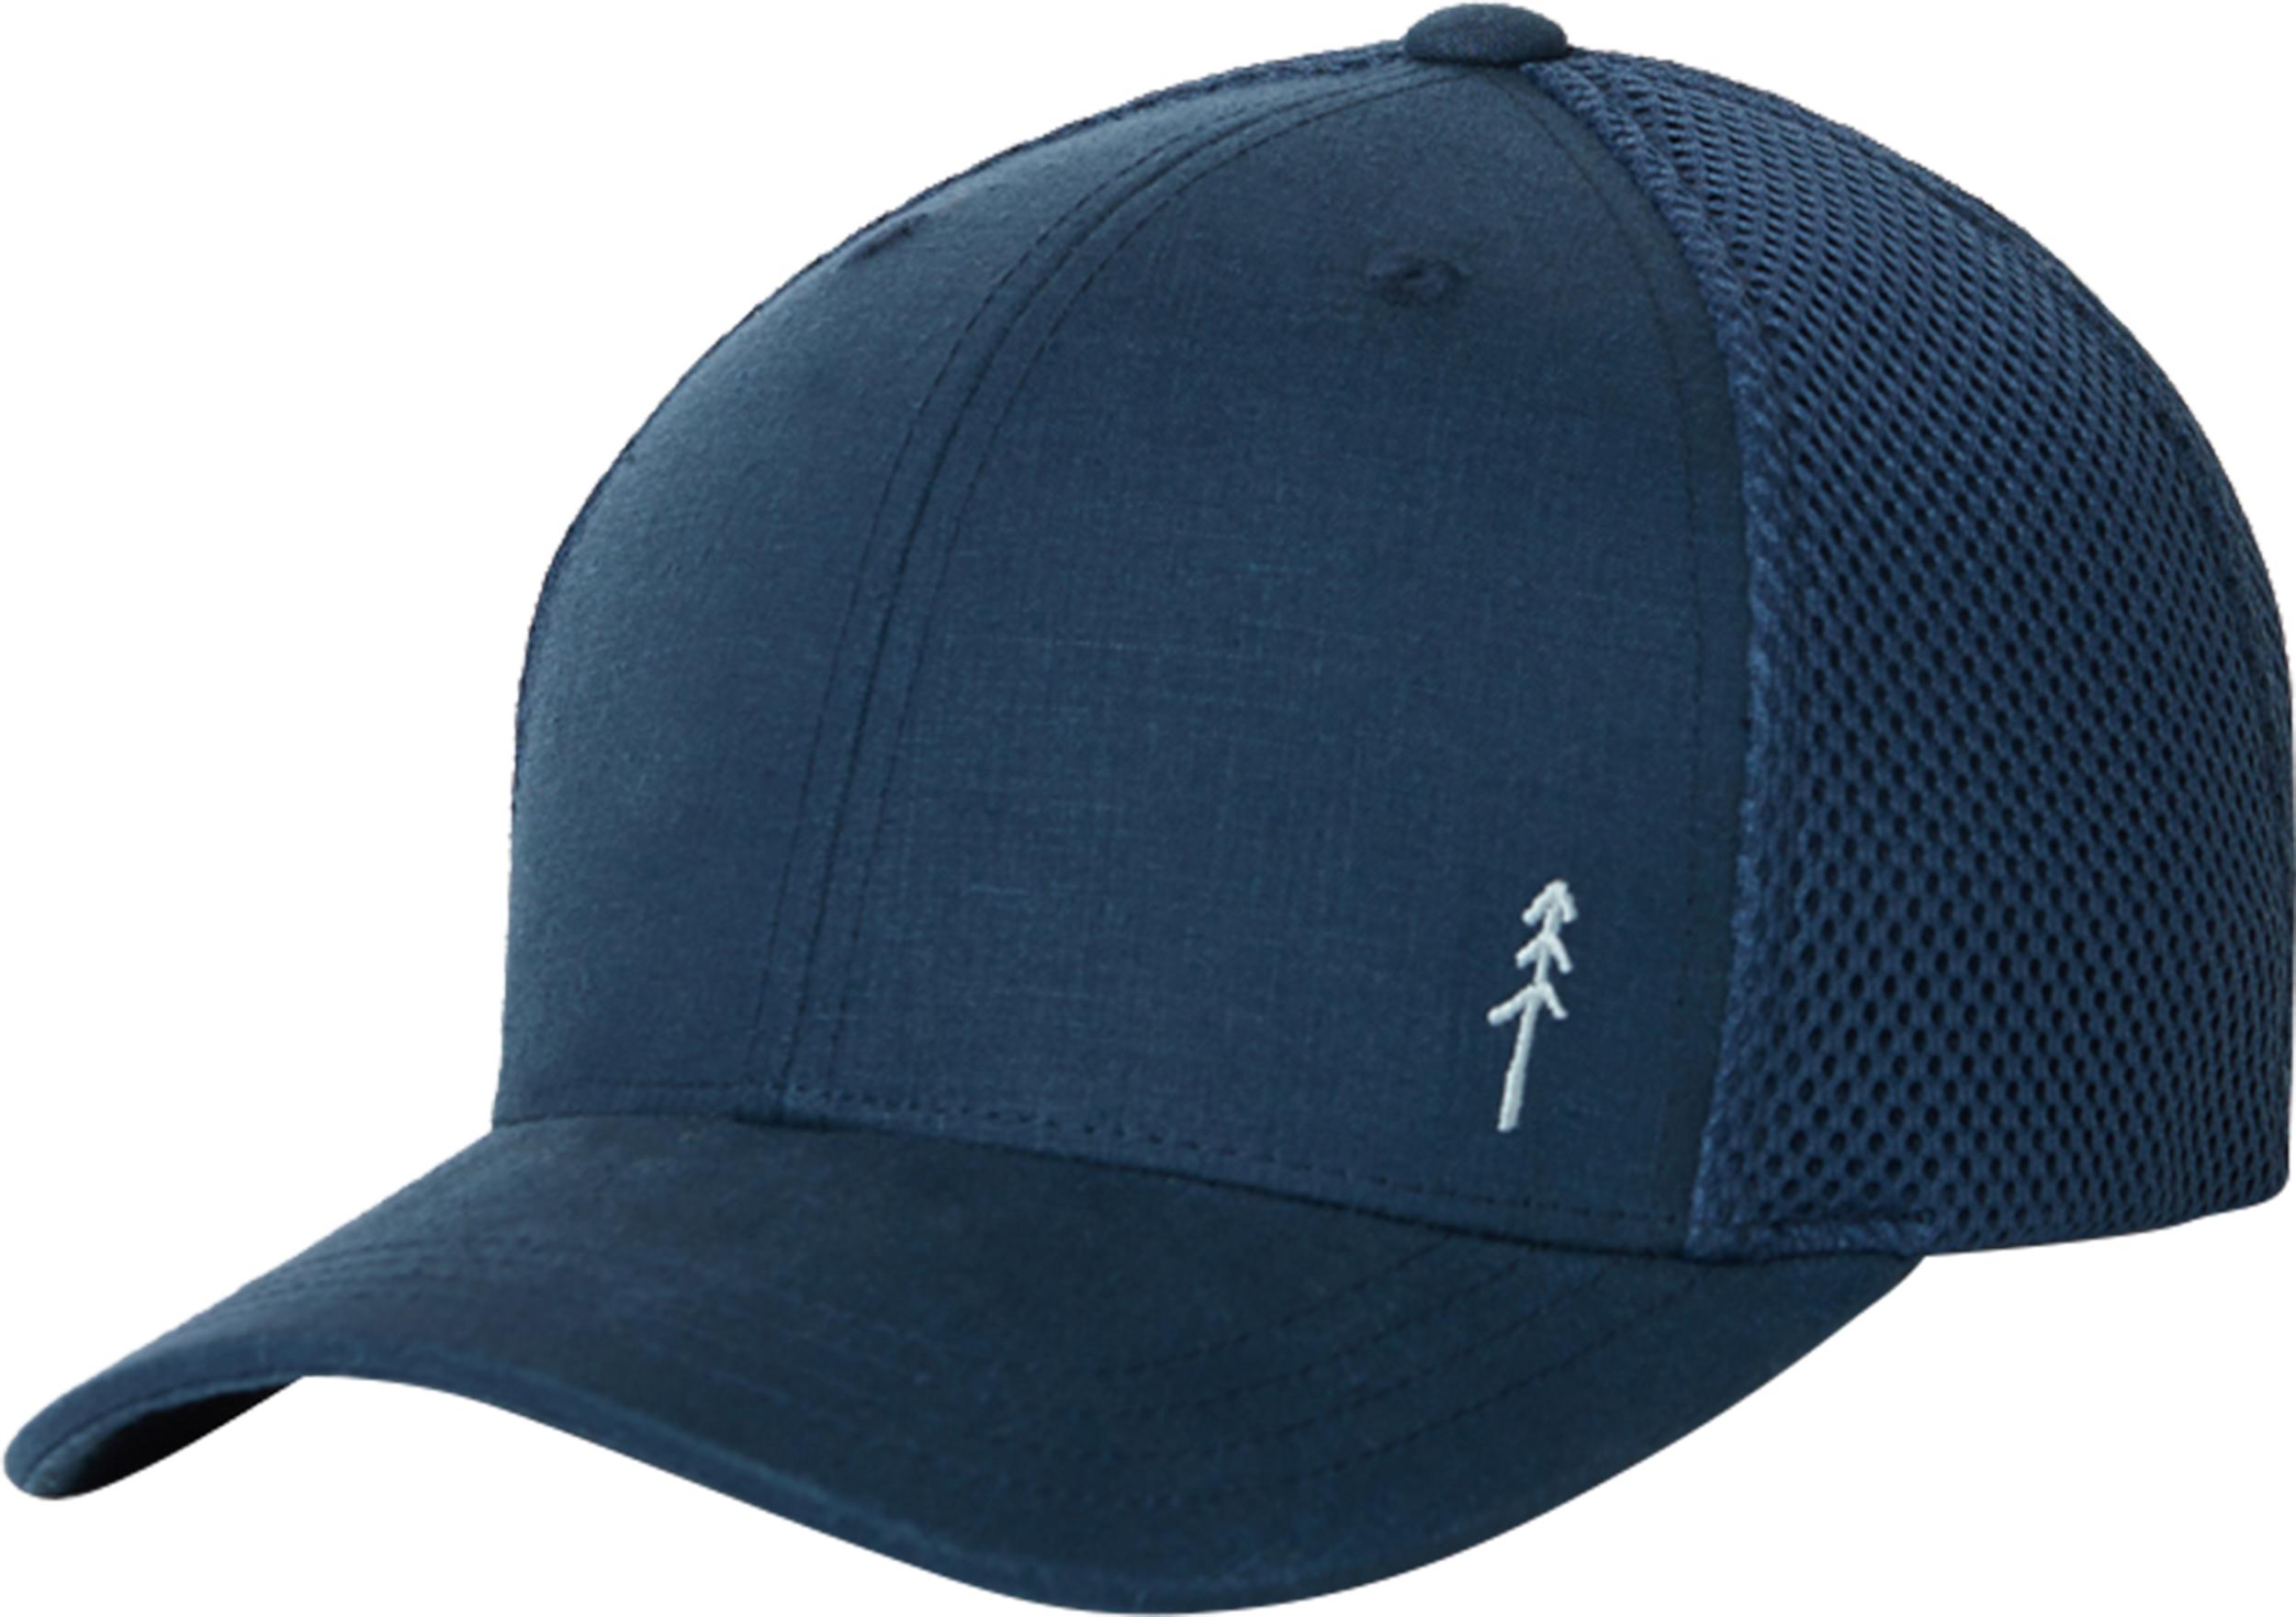 4891f216f56 Caps | MEC